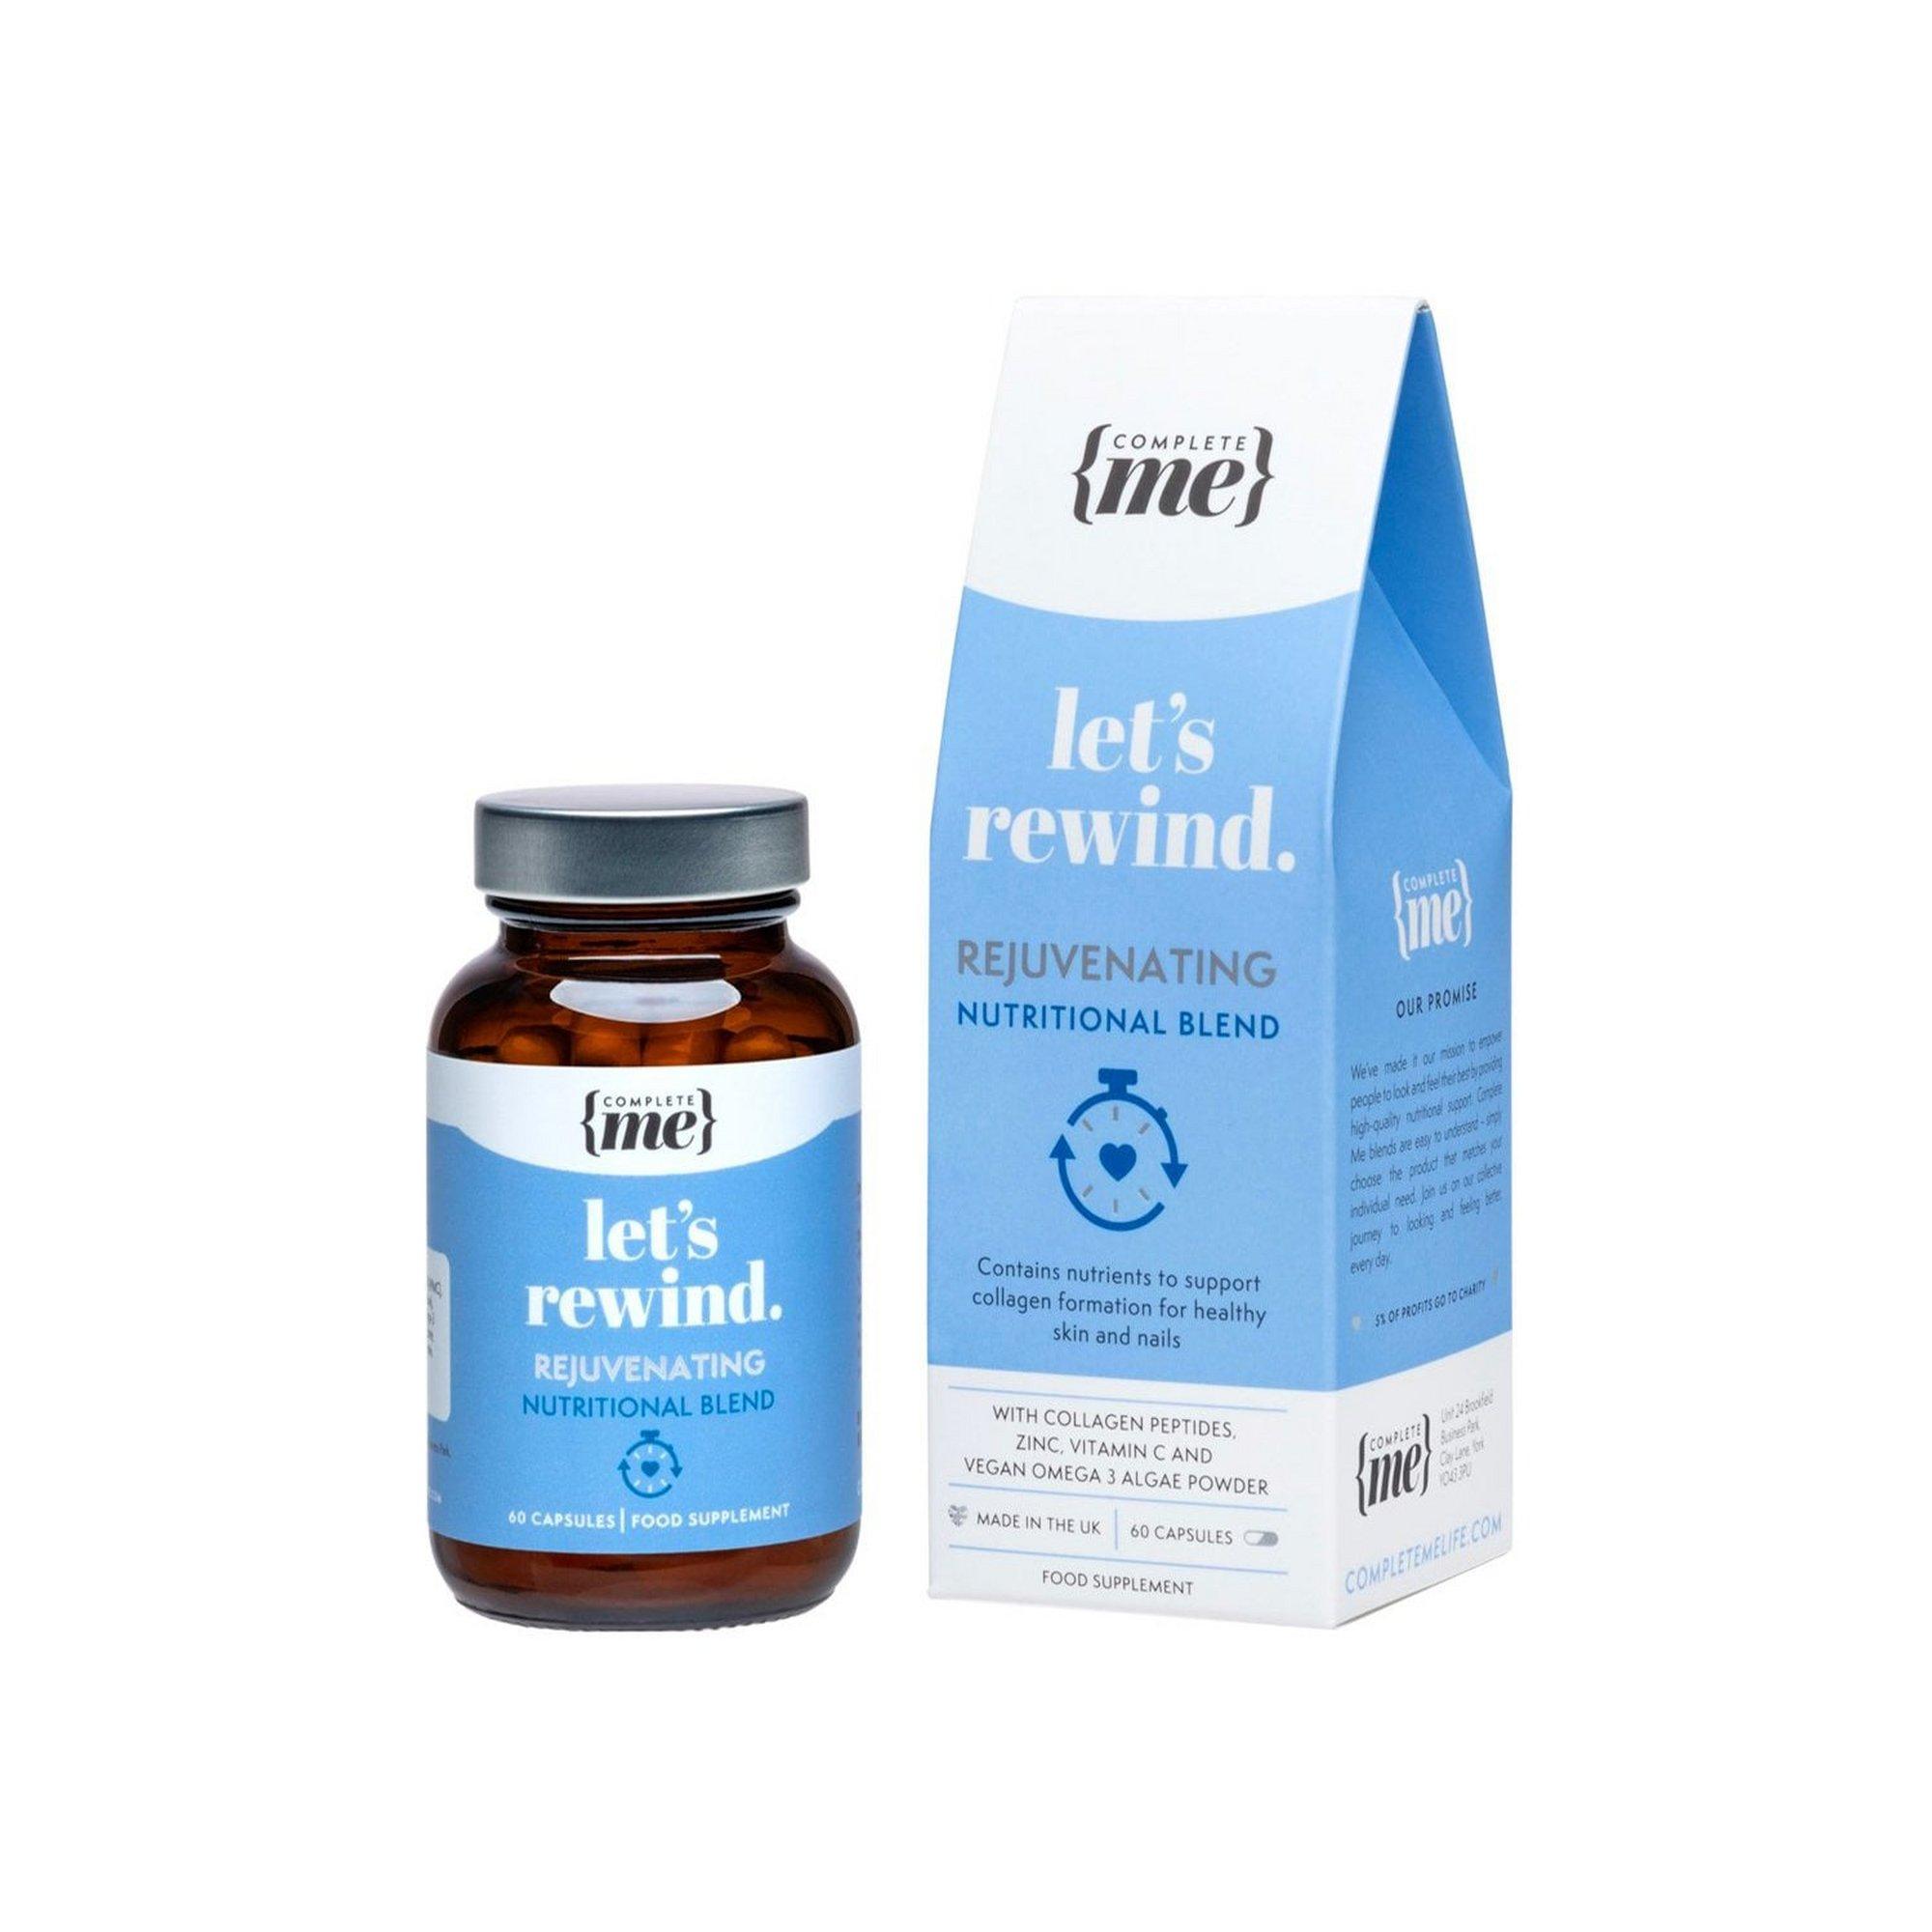 Image of Complete Me Lets Rewind Rejuvenating Nutritional Blend Capsules